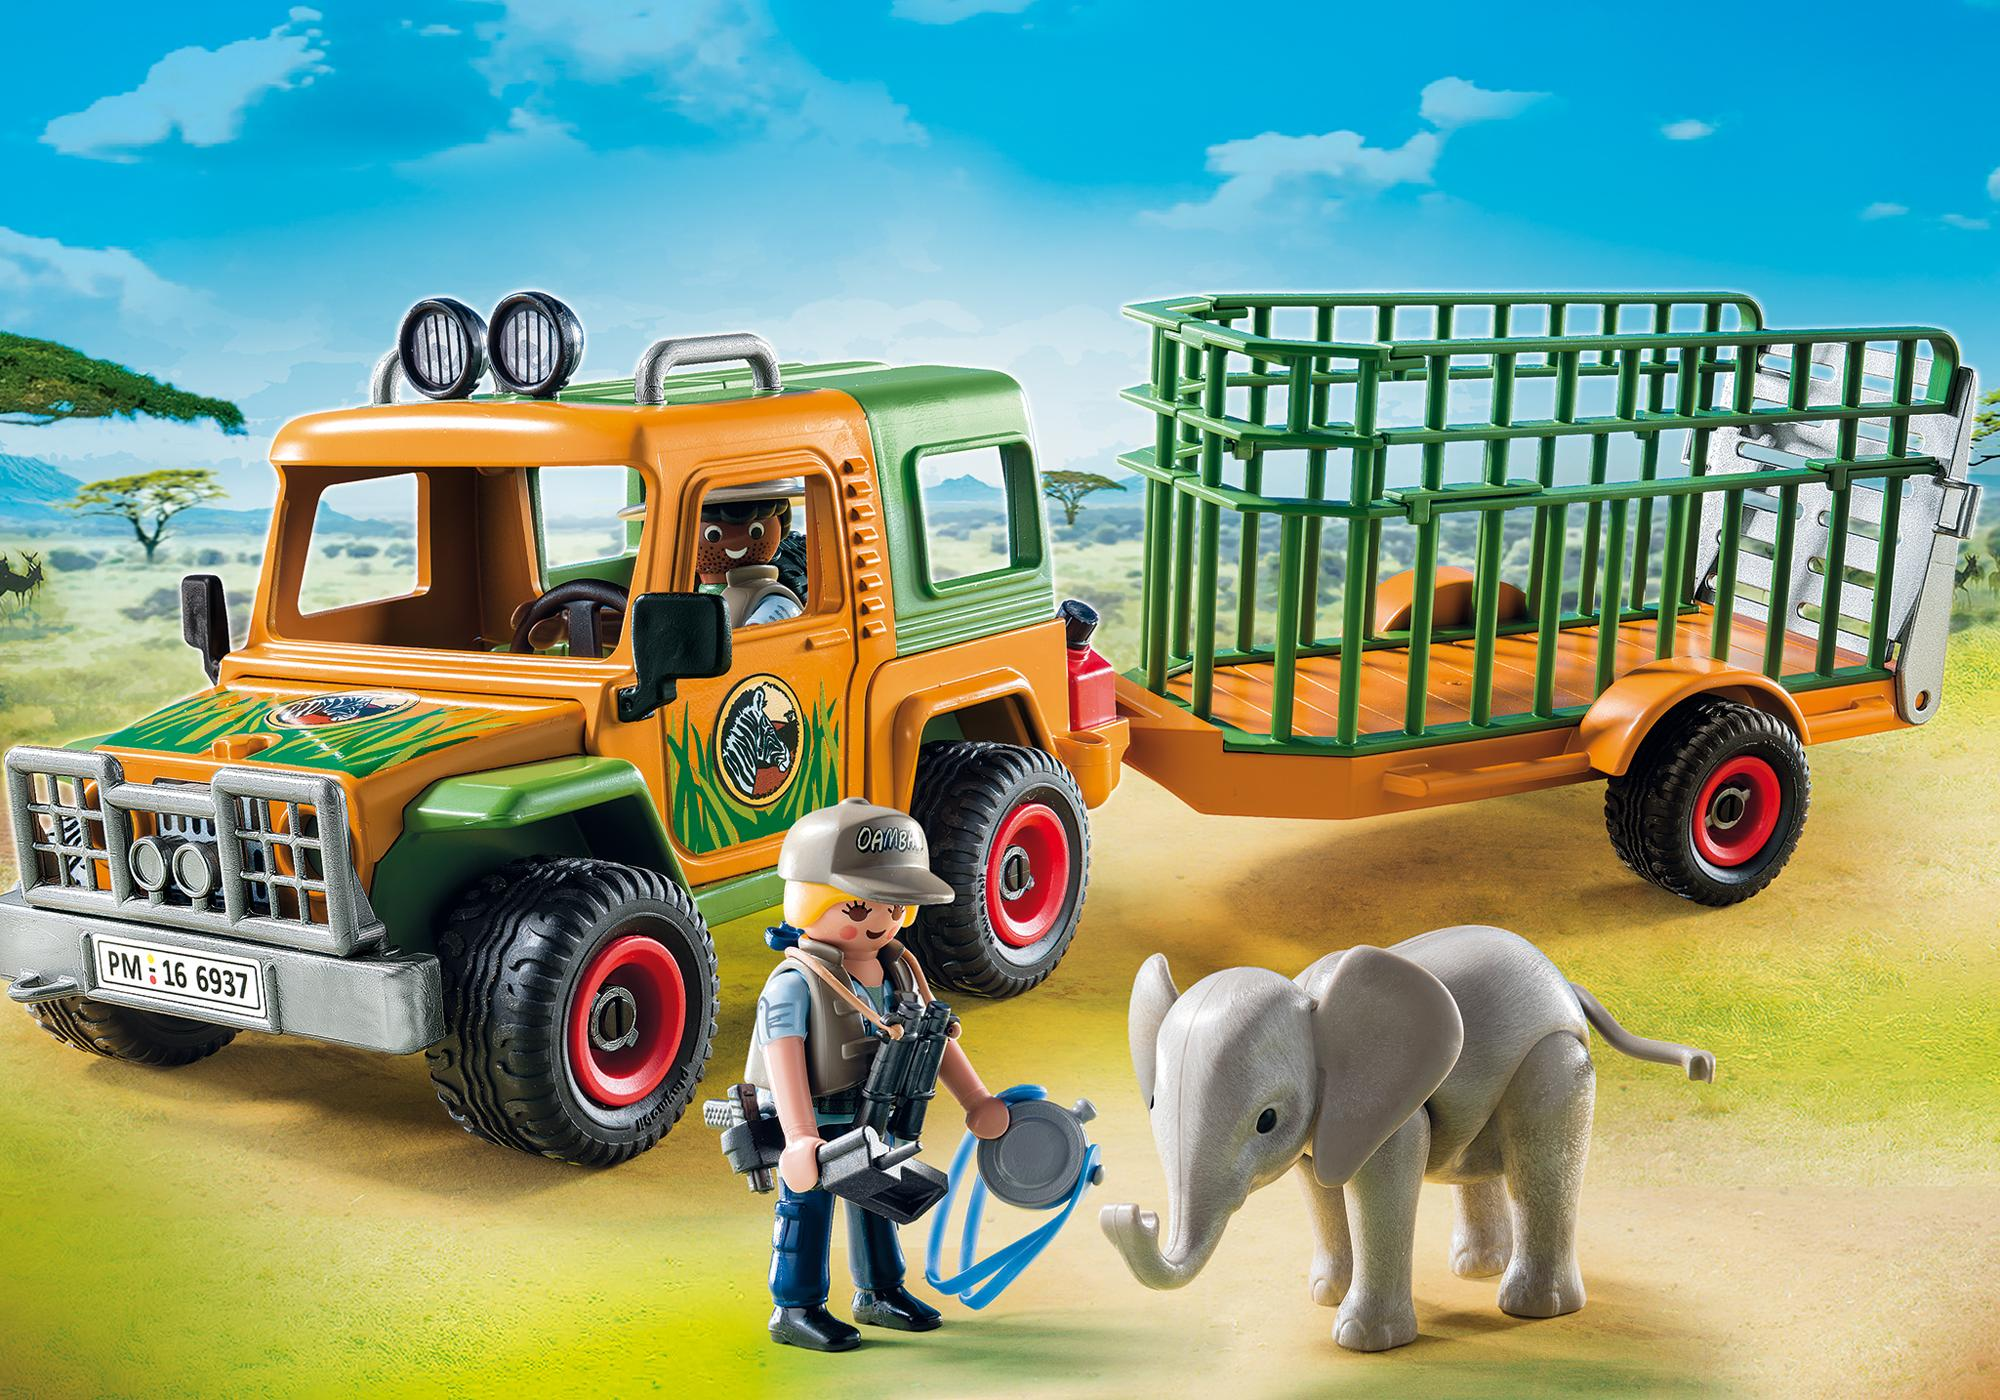 http://media.playmobil.com/i/playmobil/6937_product_detail/Camión con Elefante